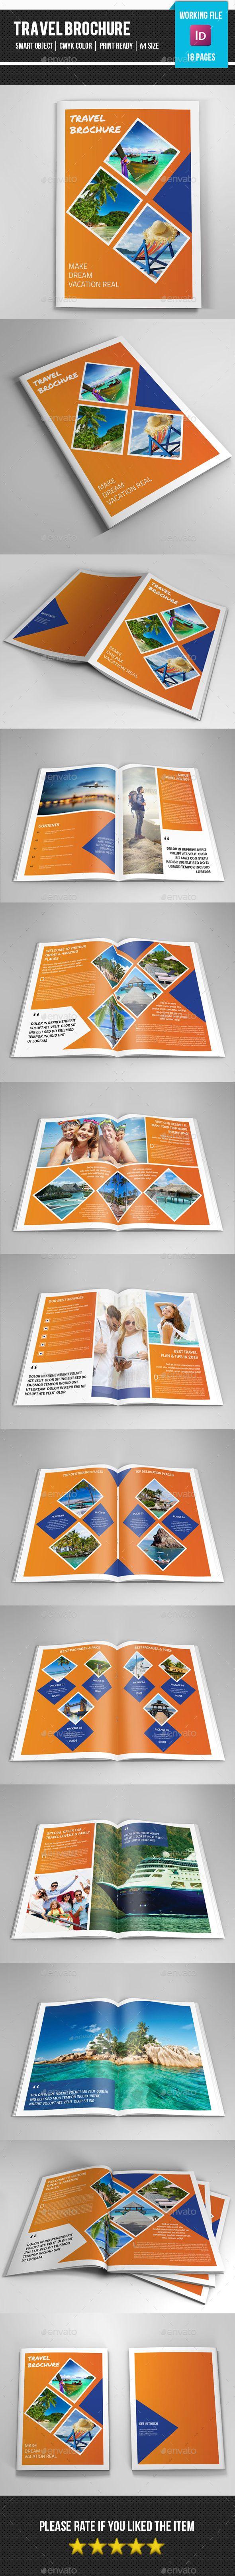 Travel Brochure/Catalog - Corporate Brochure Template InDesign INDD. Download here: http://graphicriver.net/item/travel-brochurecatalogv245/11401568?s_rank=1752&ref=yinkira